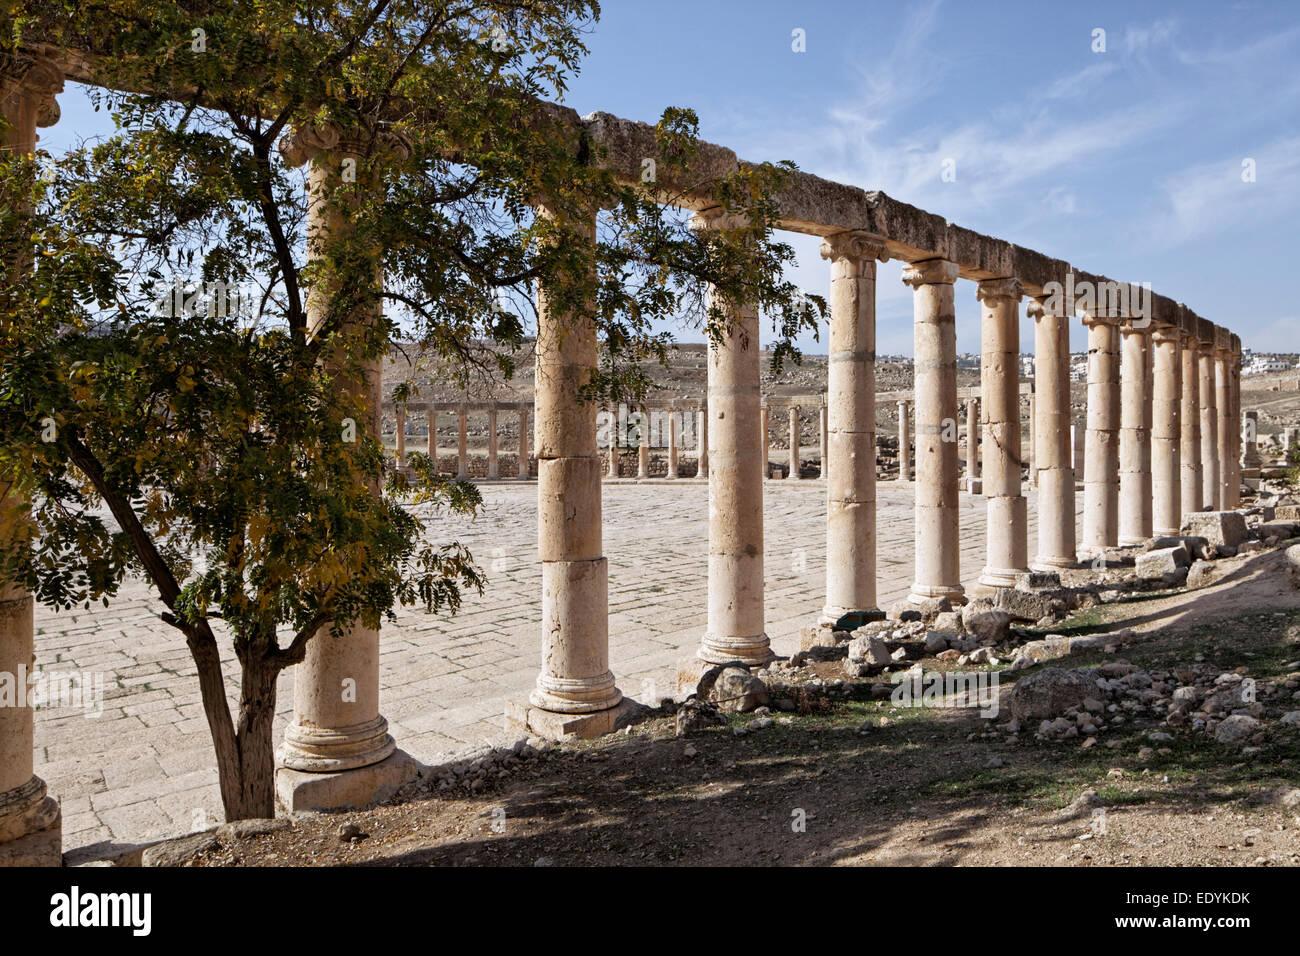 Columns, oval Forum, ancient Roman city of Jerash, part of the Decapolis, Jerash, Jerash Governorate, Jordan - Stock Image